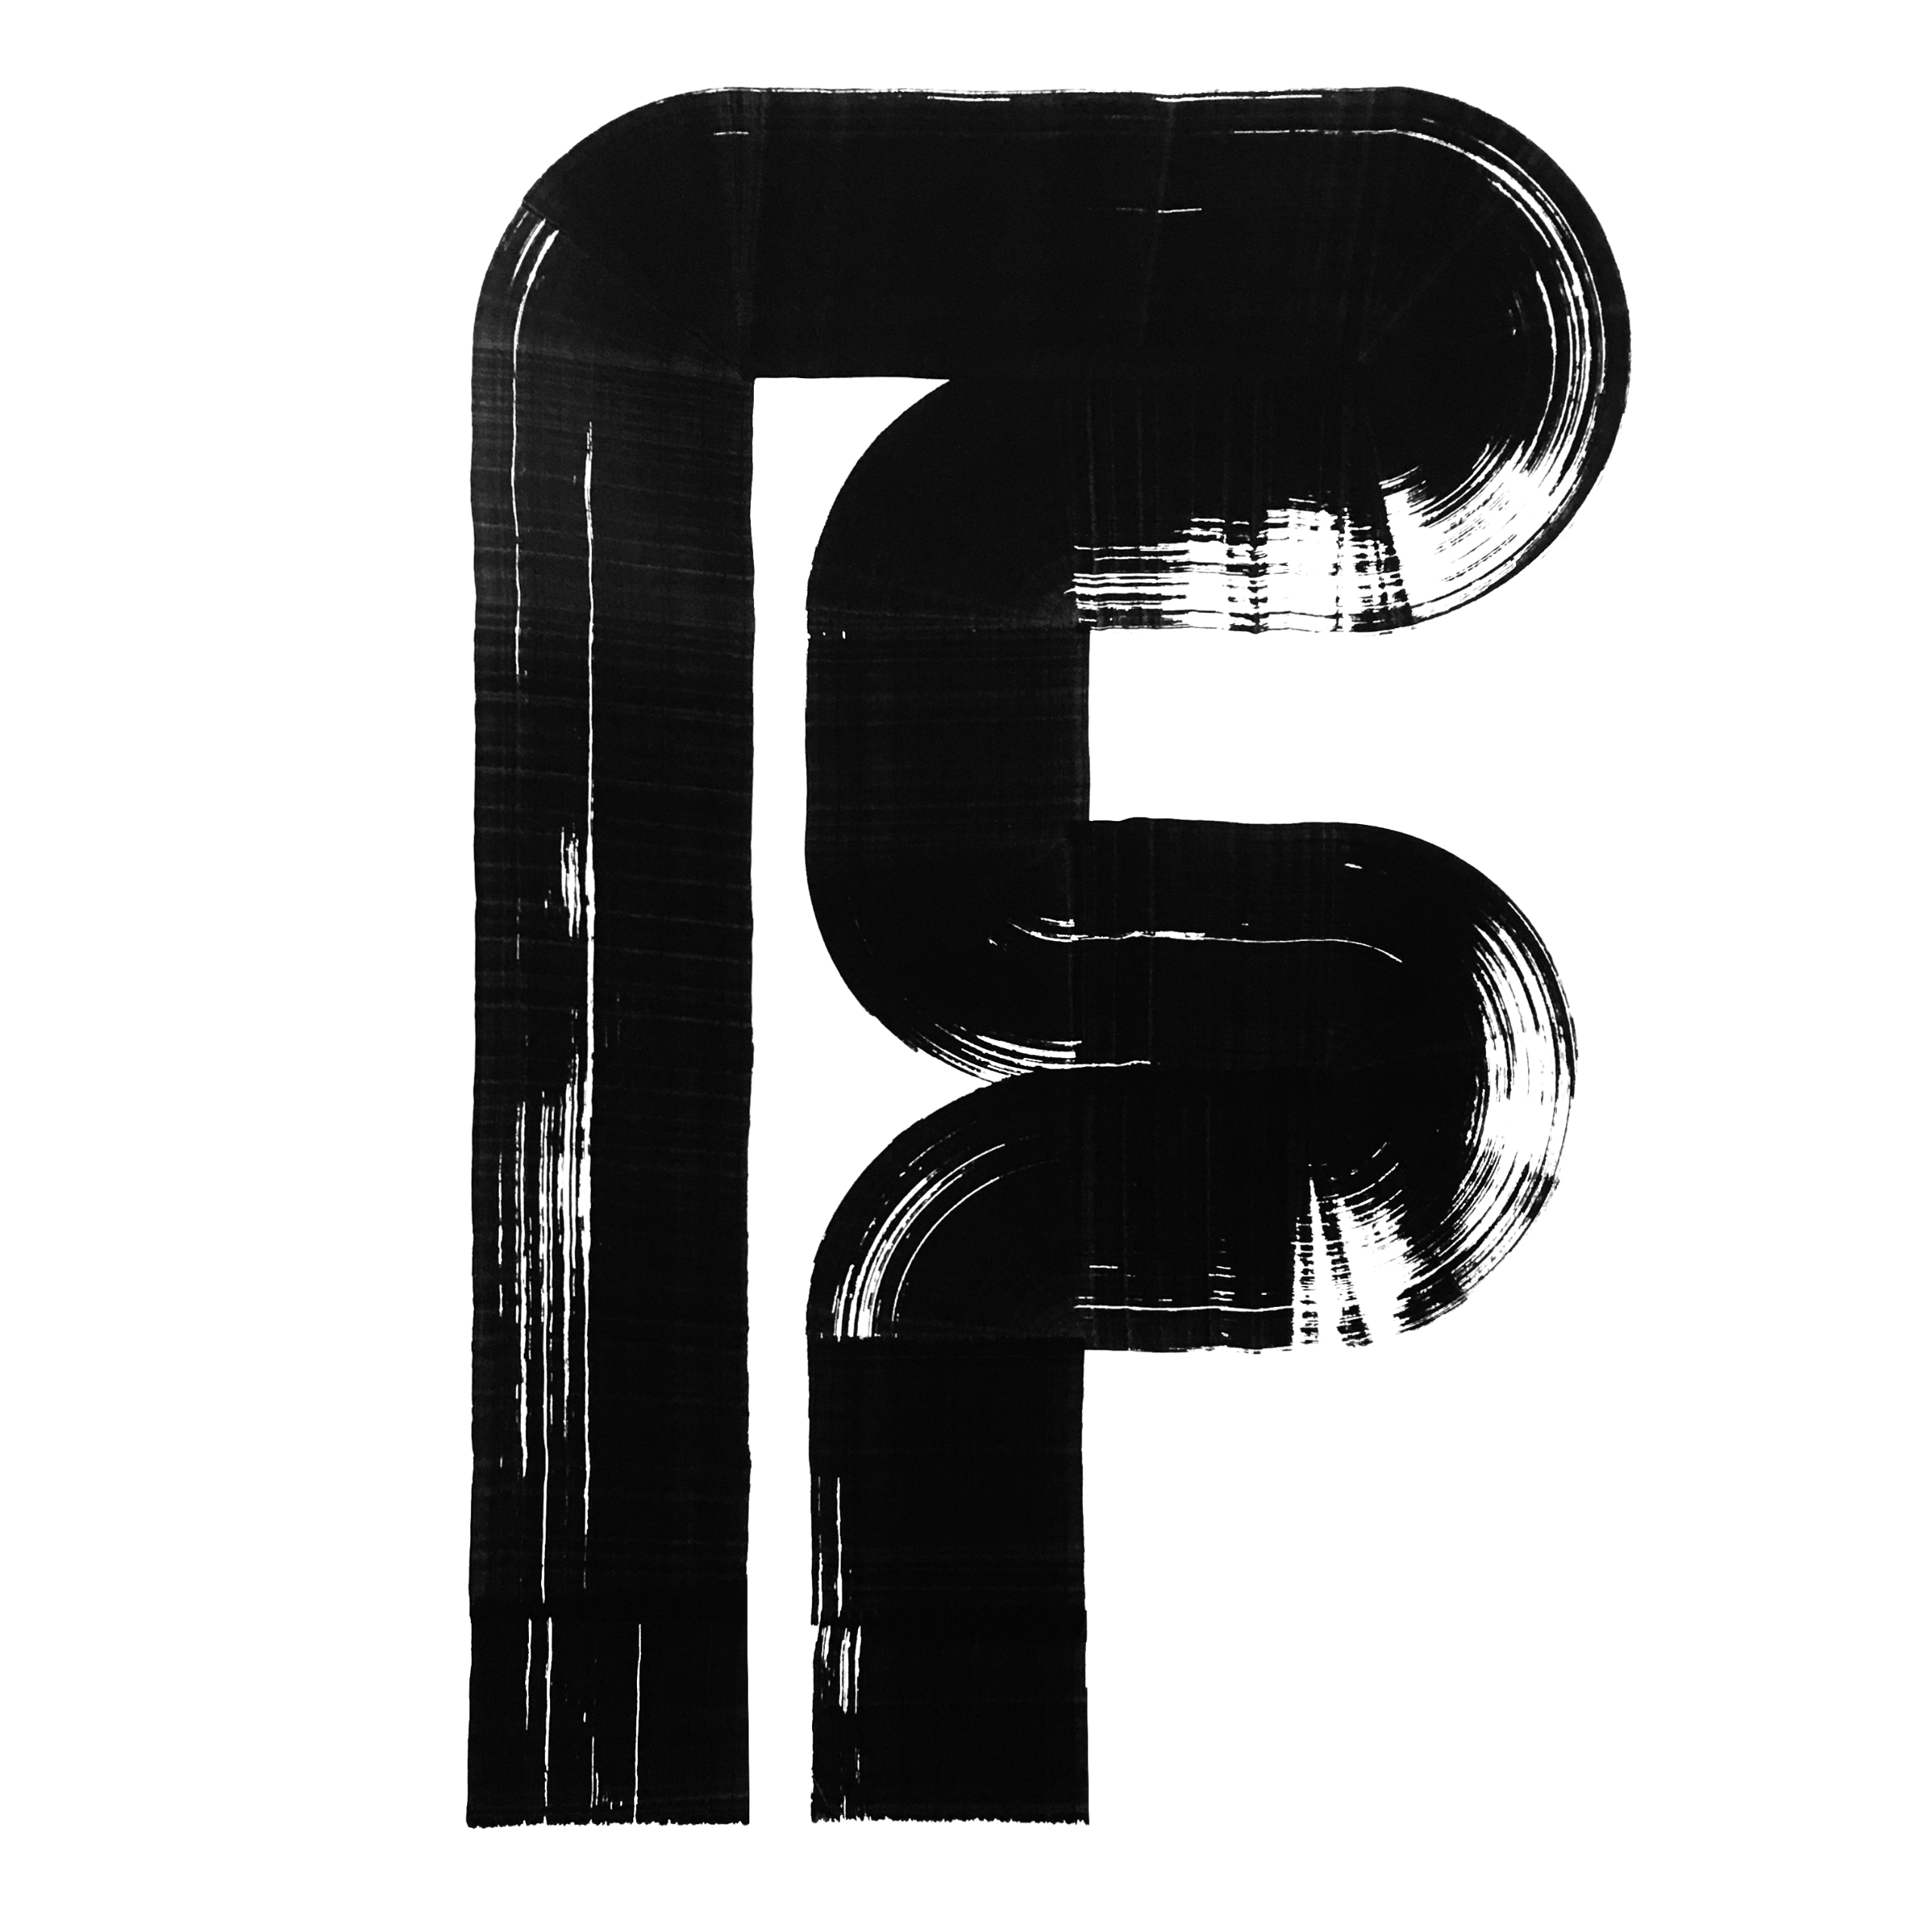 36daysoftype, 36days_F, typography - t_o_w_e_r_s | ello